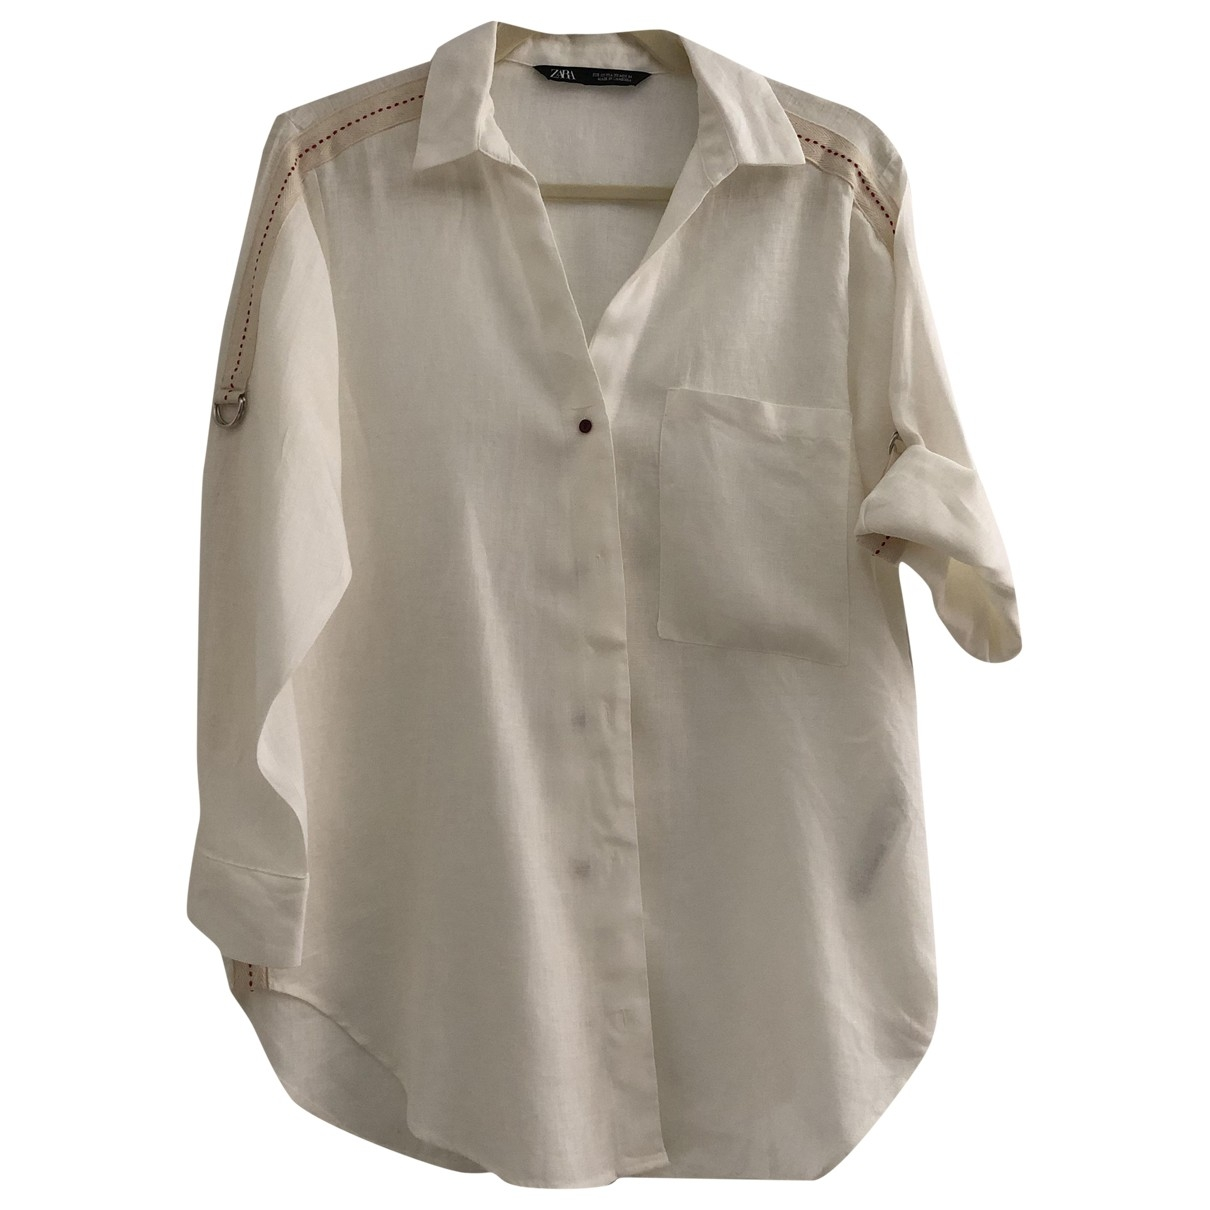 Zara - Top   pour femme en lin - blanc